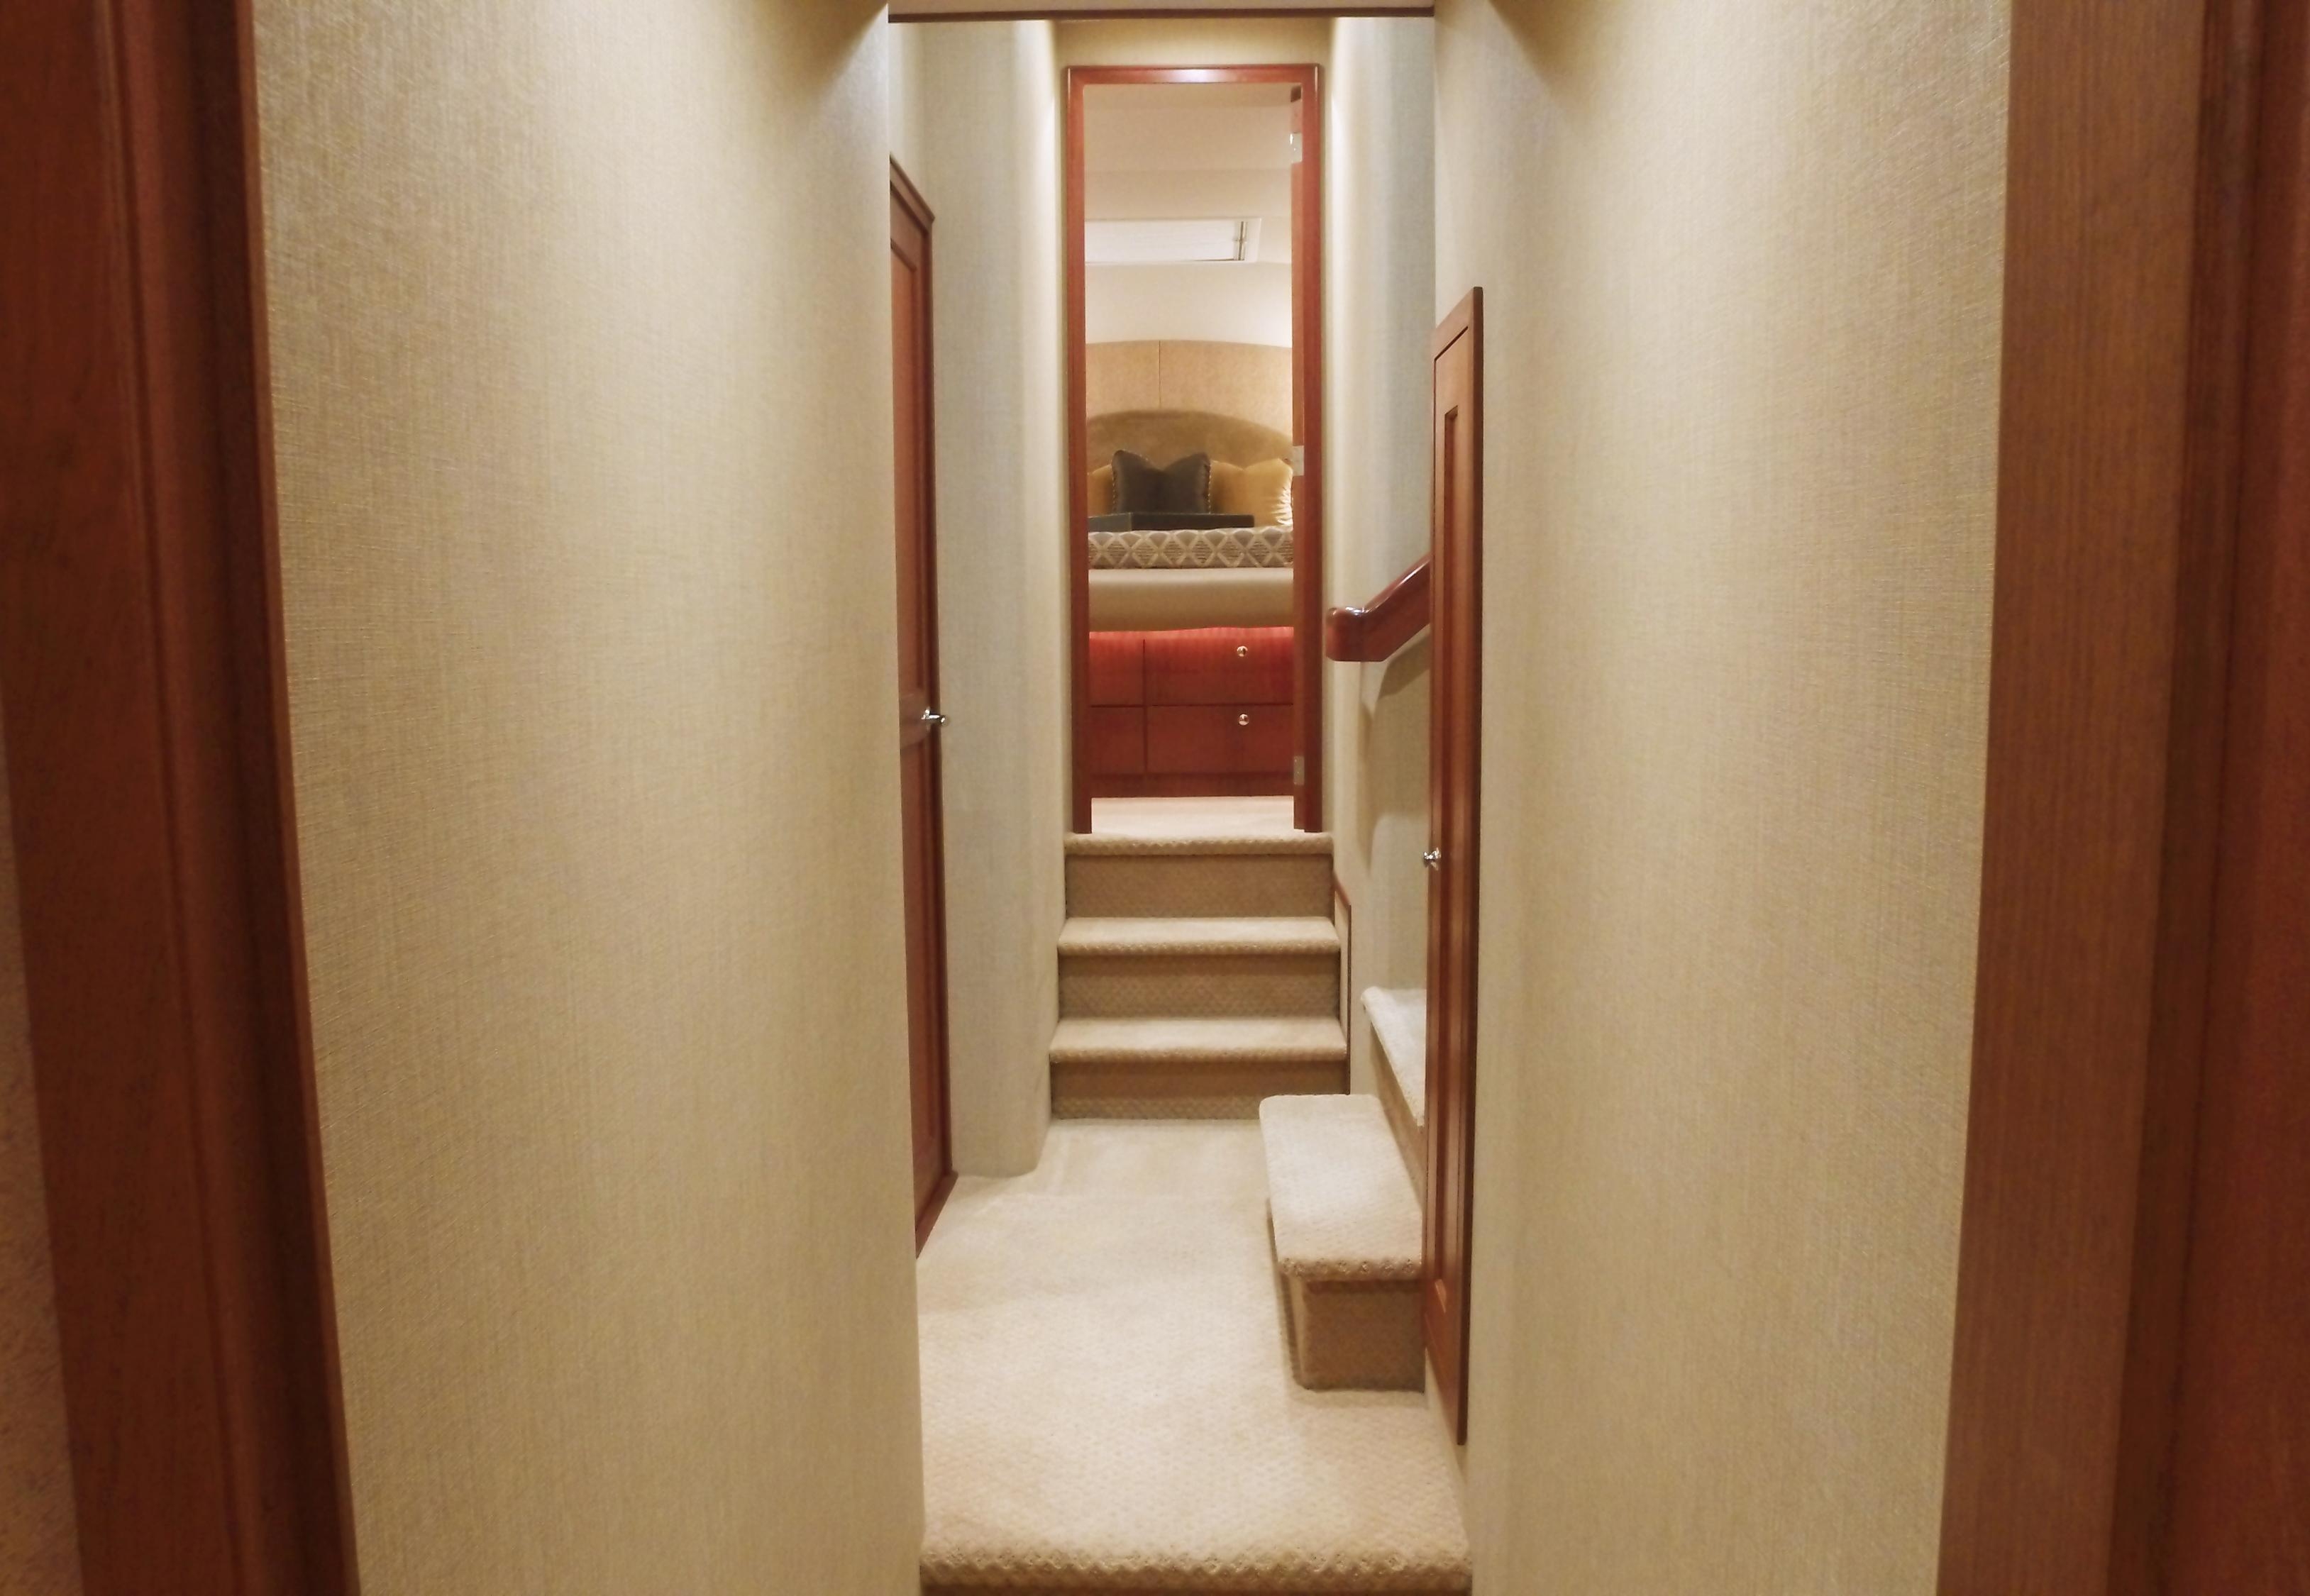 Hallway to VIP Stateroom